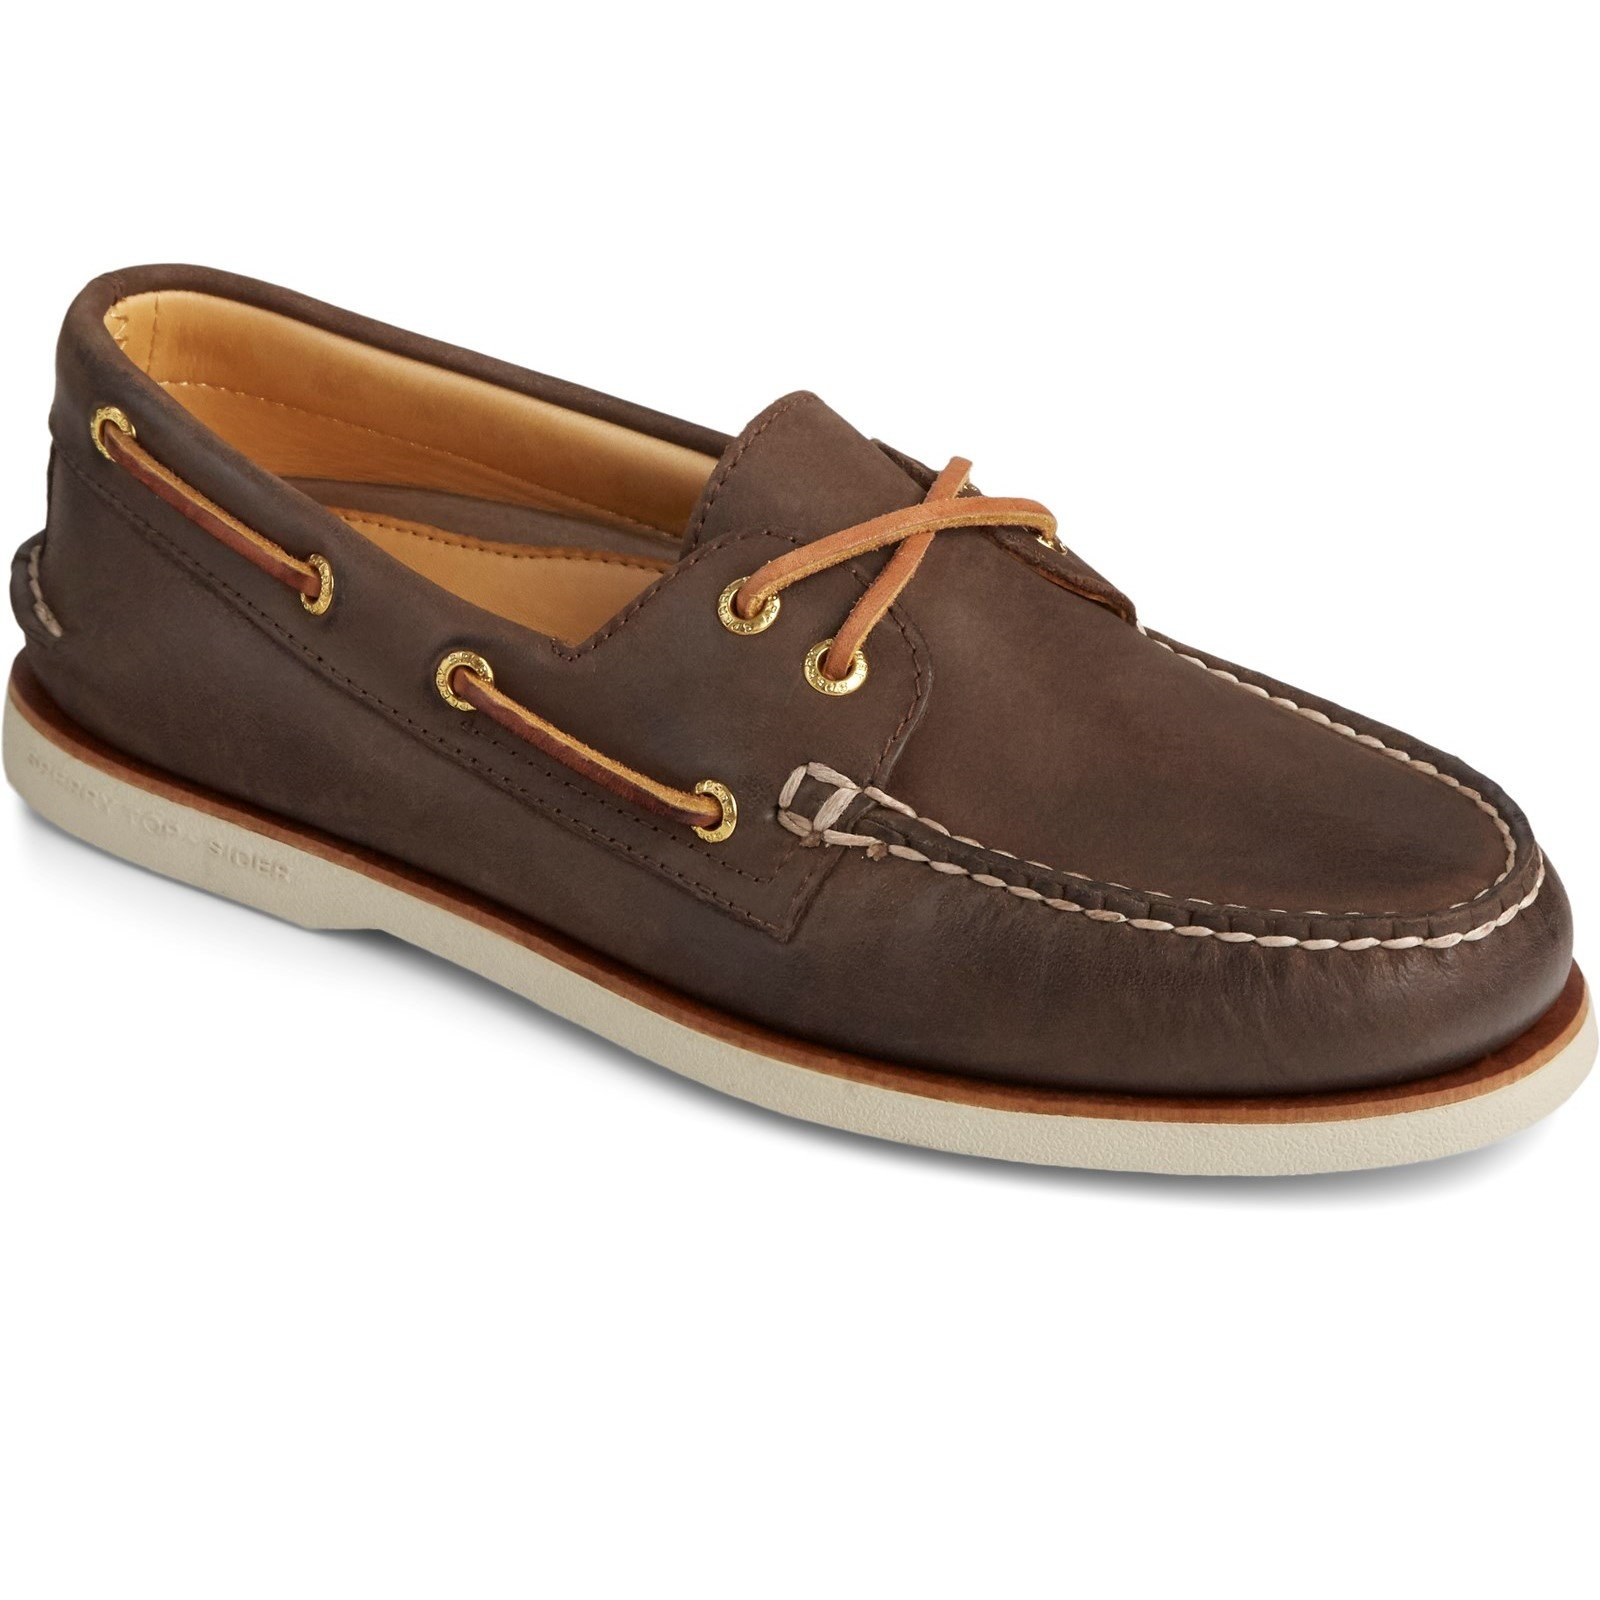 Sperry Men's Cup Authentic Original Boat Shoe Various Colours 31735 - Brown 8